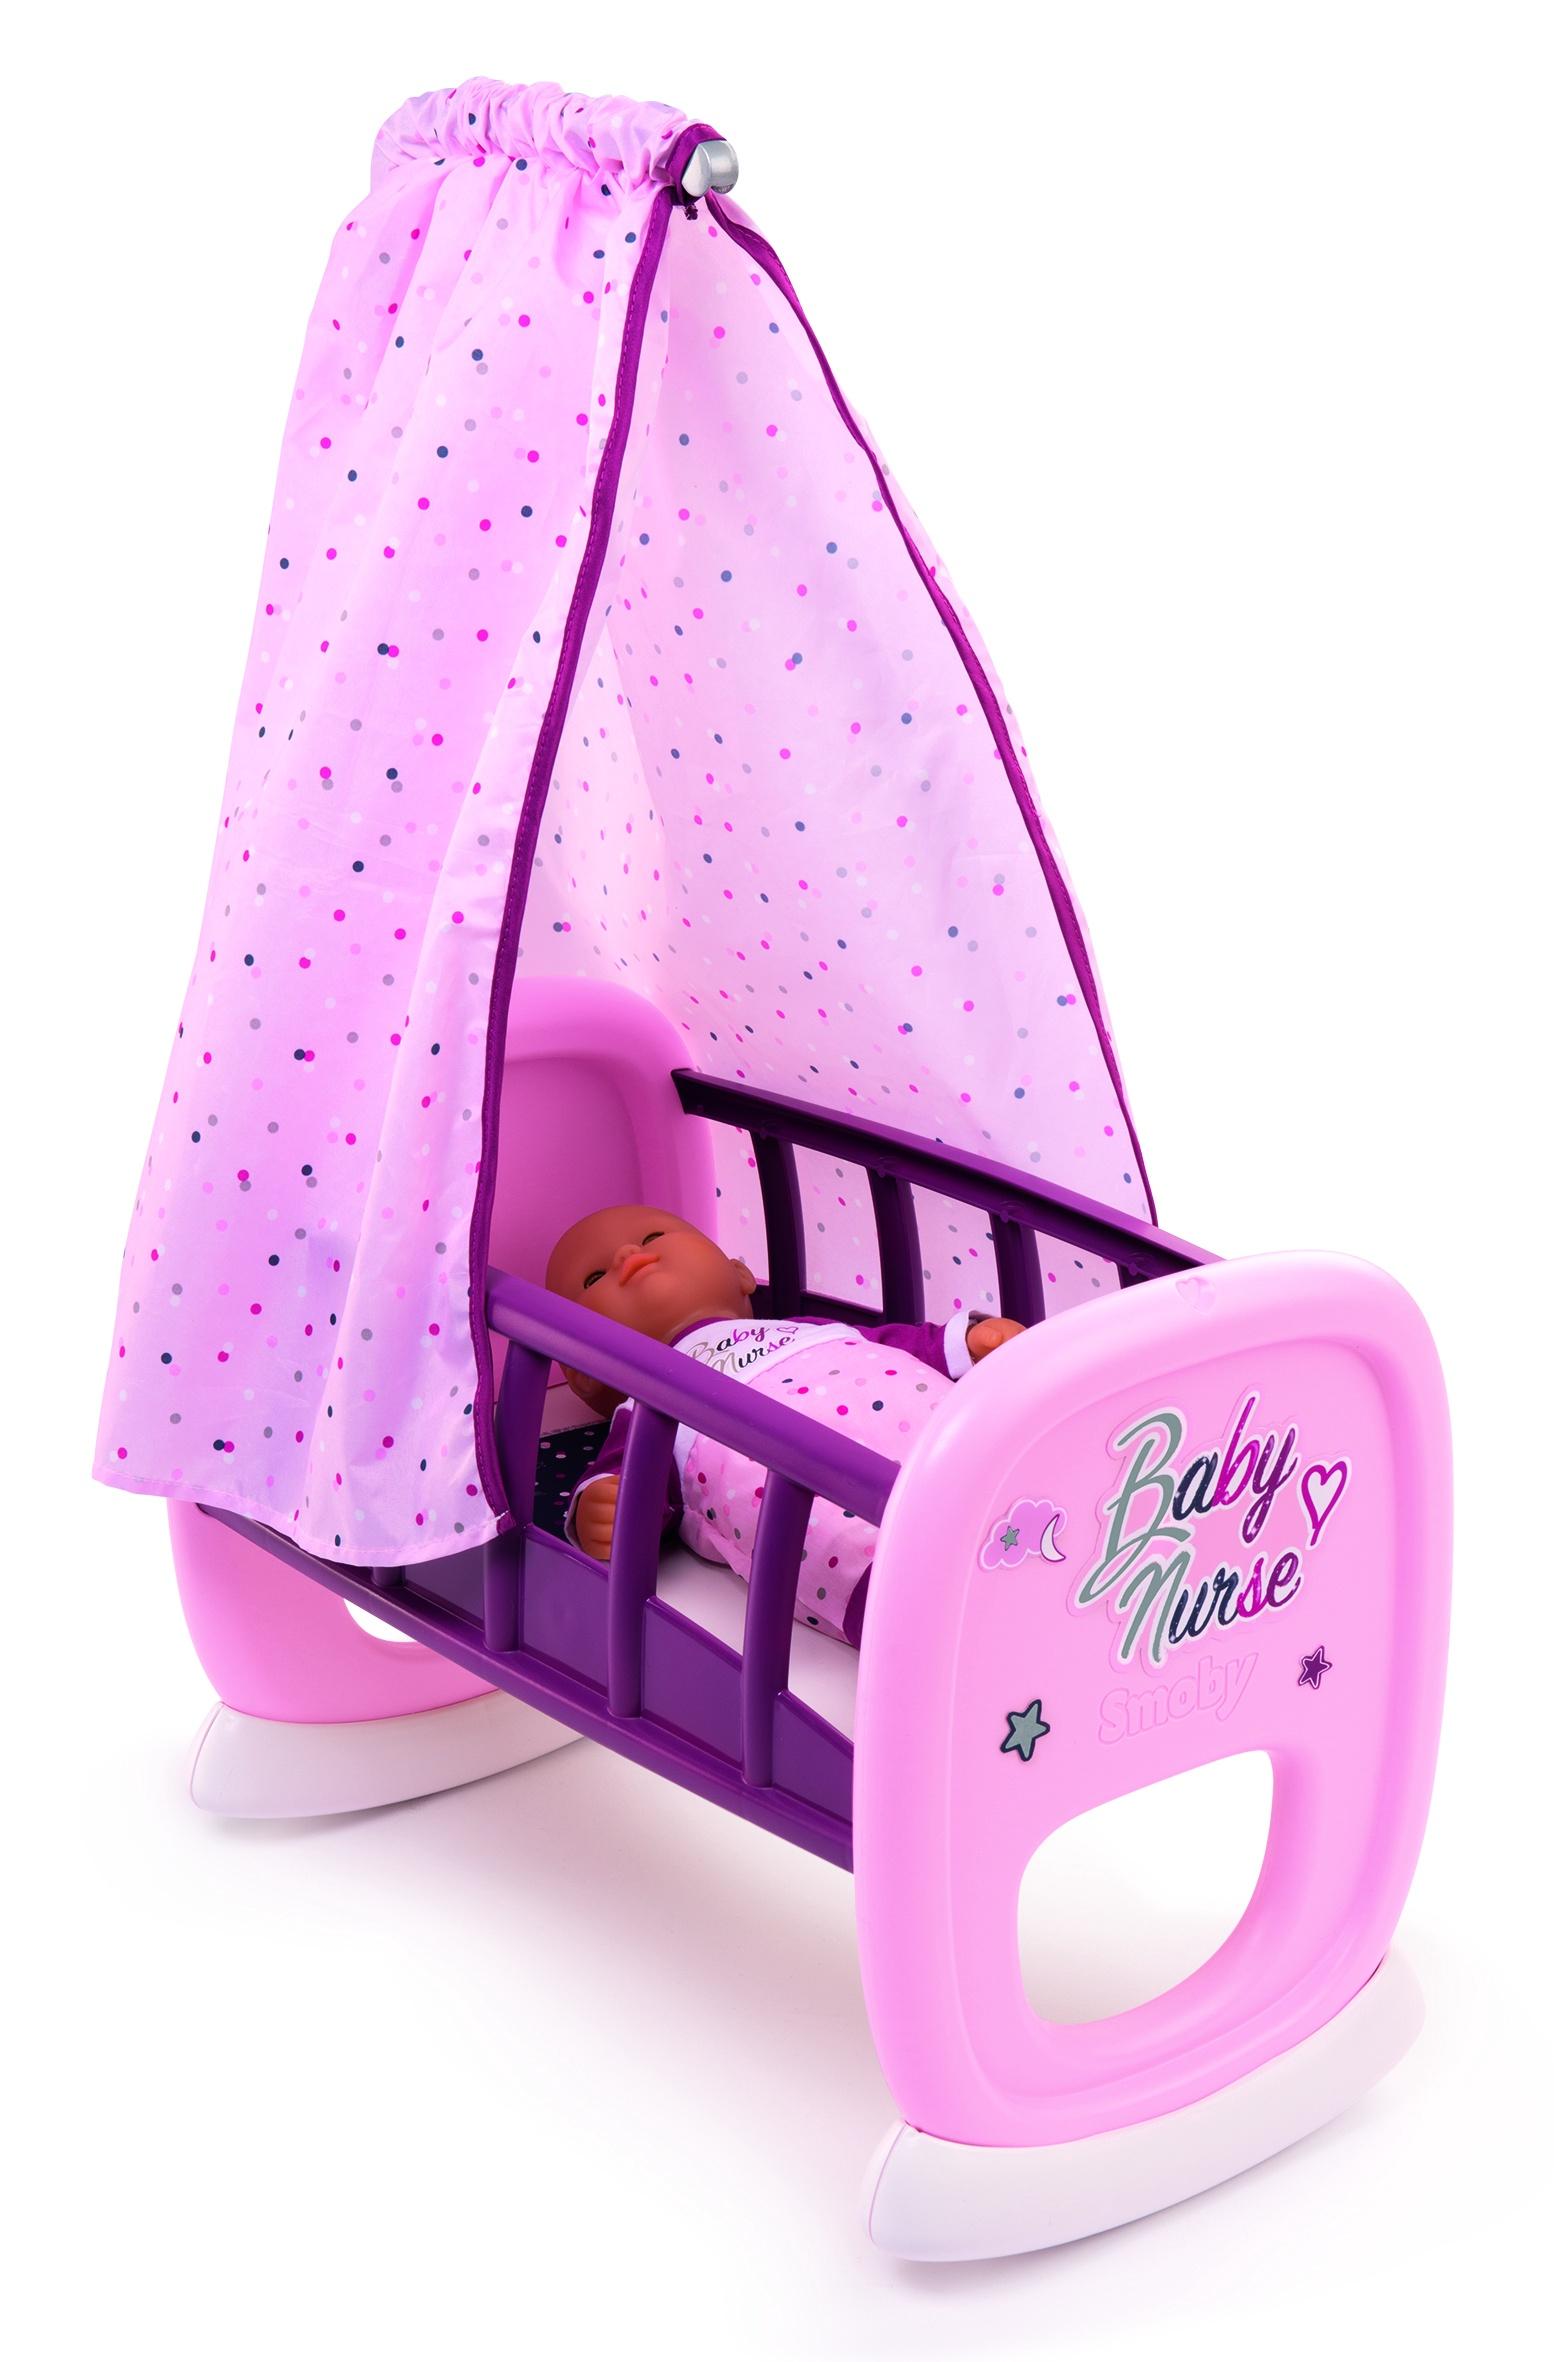 Baby Nurse Колыбель для пупса, 46,9х27,2х68,7 см